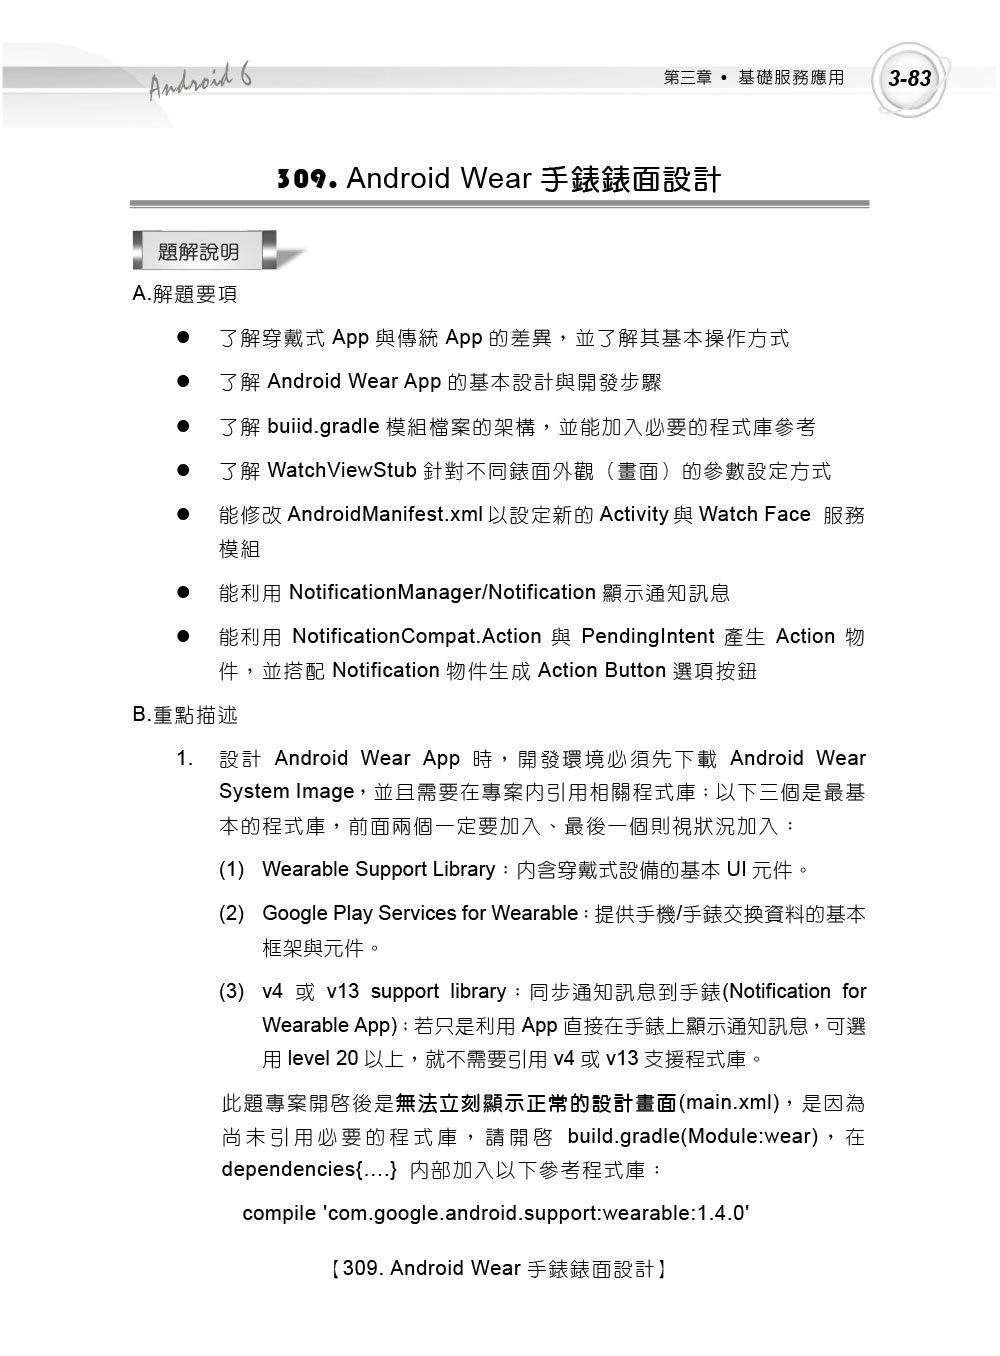 TQC+ 行動裝置應用程式設計認證指南解題秘笈 -- Android 6-preview-12